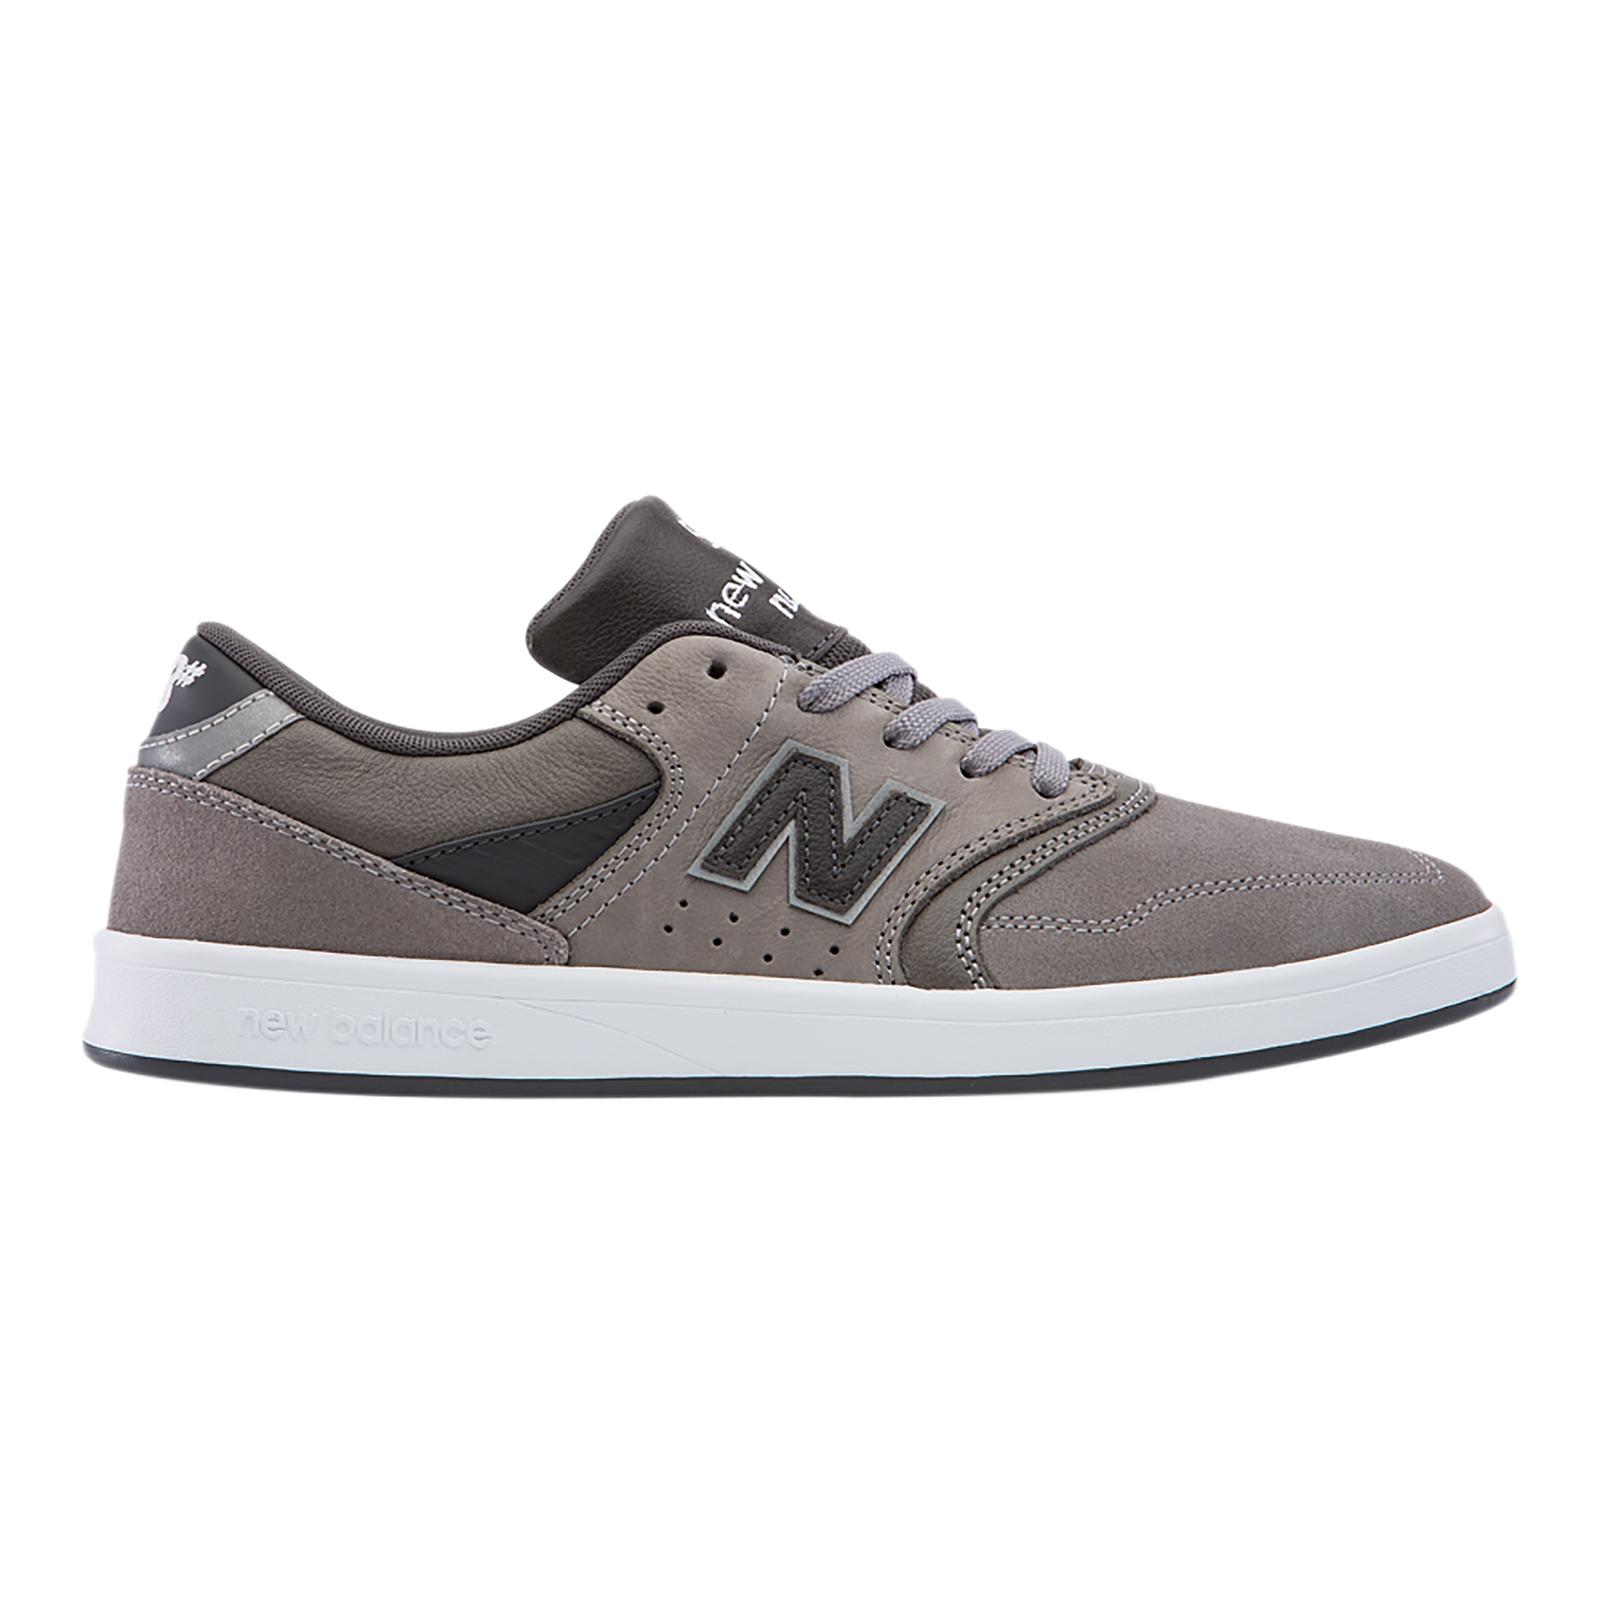 Daim Leather New Chaussure Gris D Numérique Skateboarding Balance xYF6FXaq